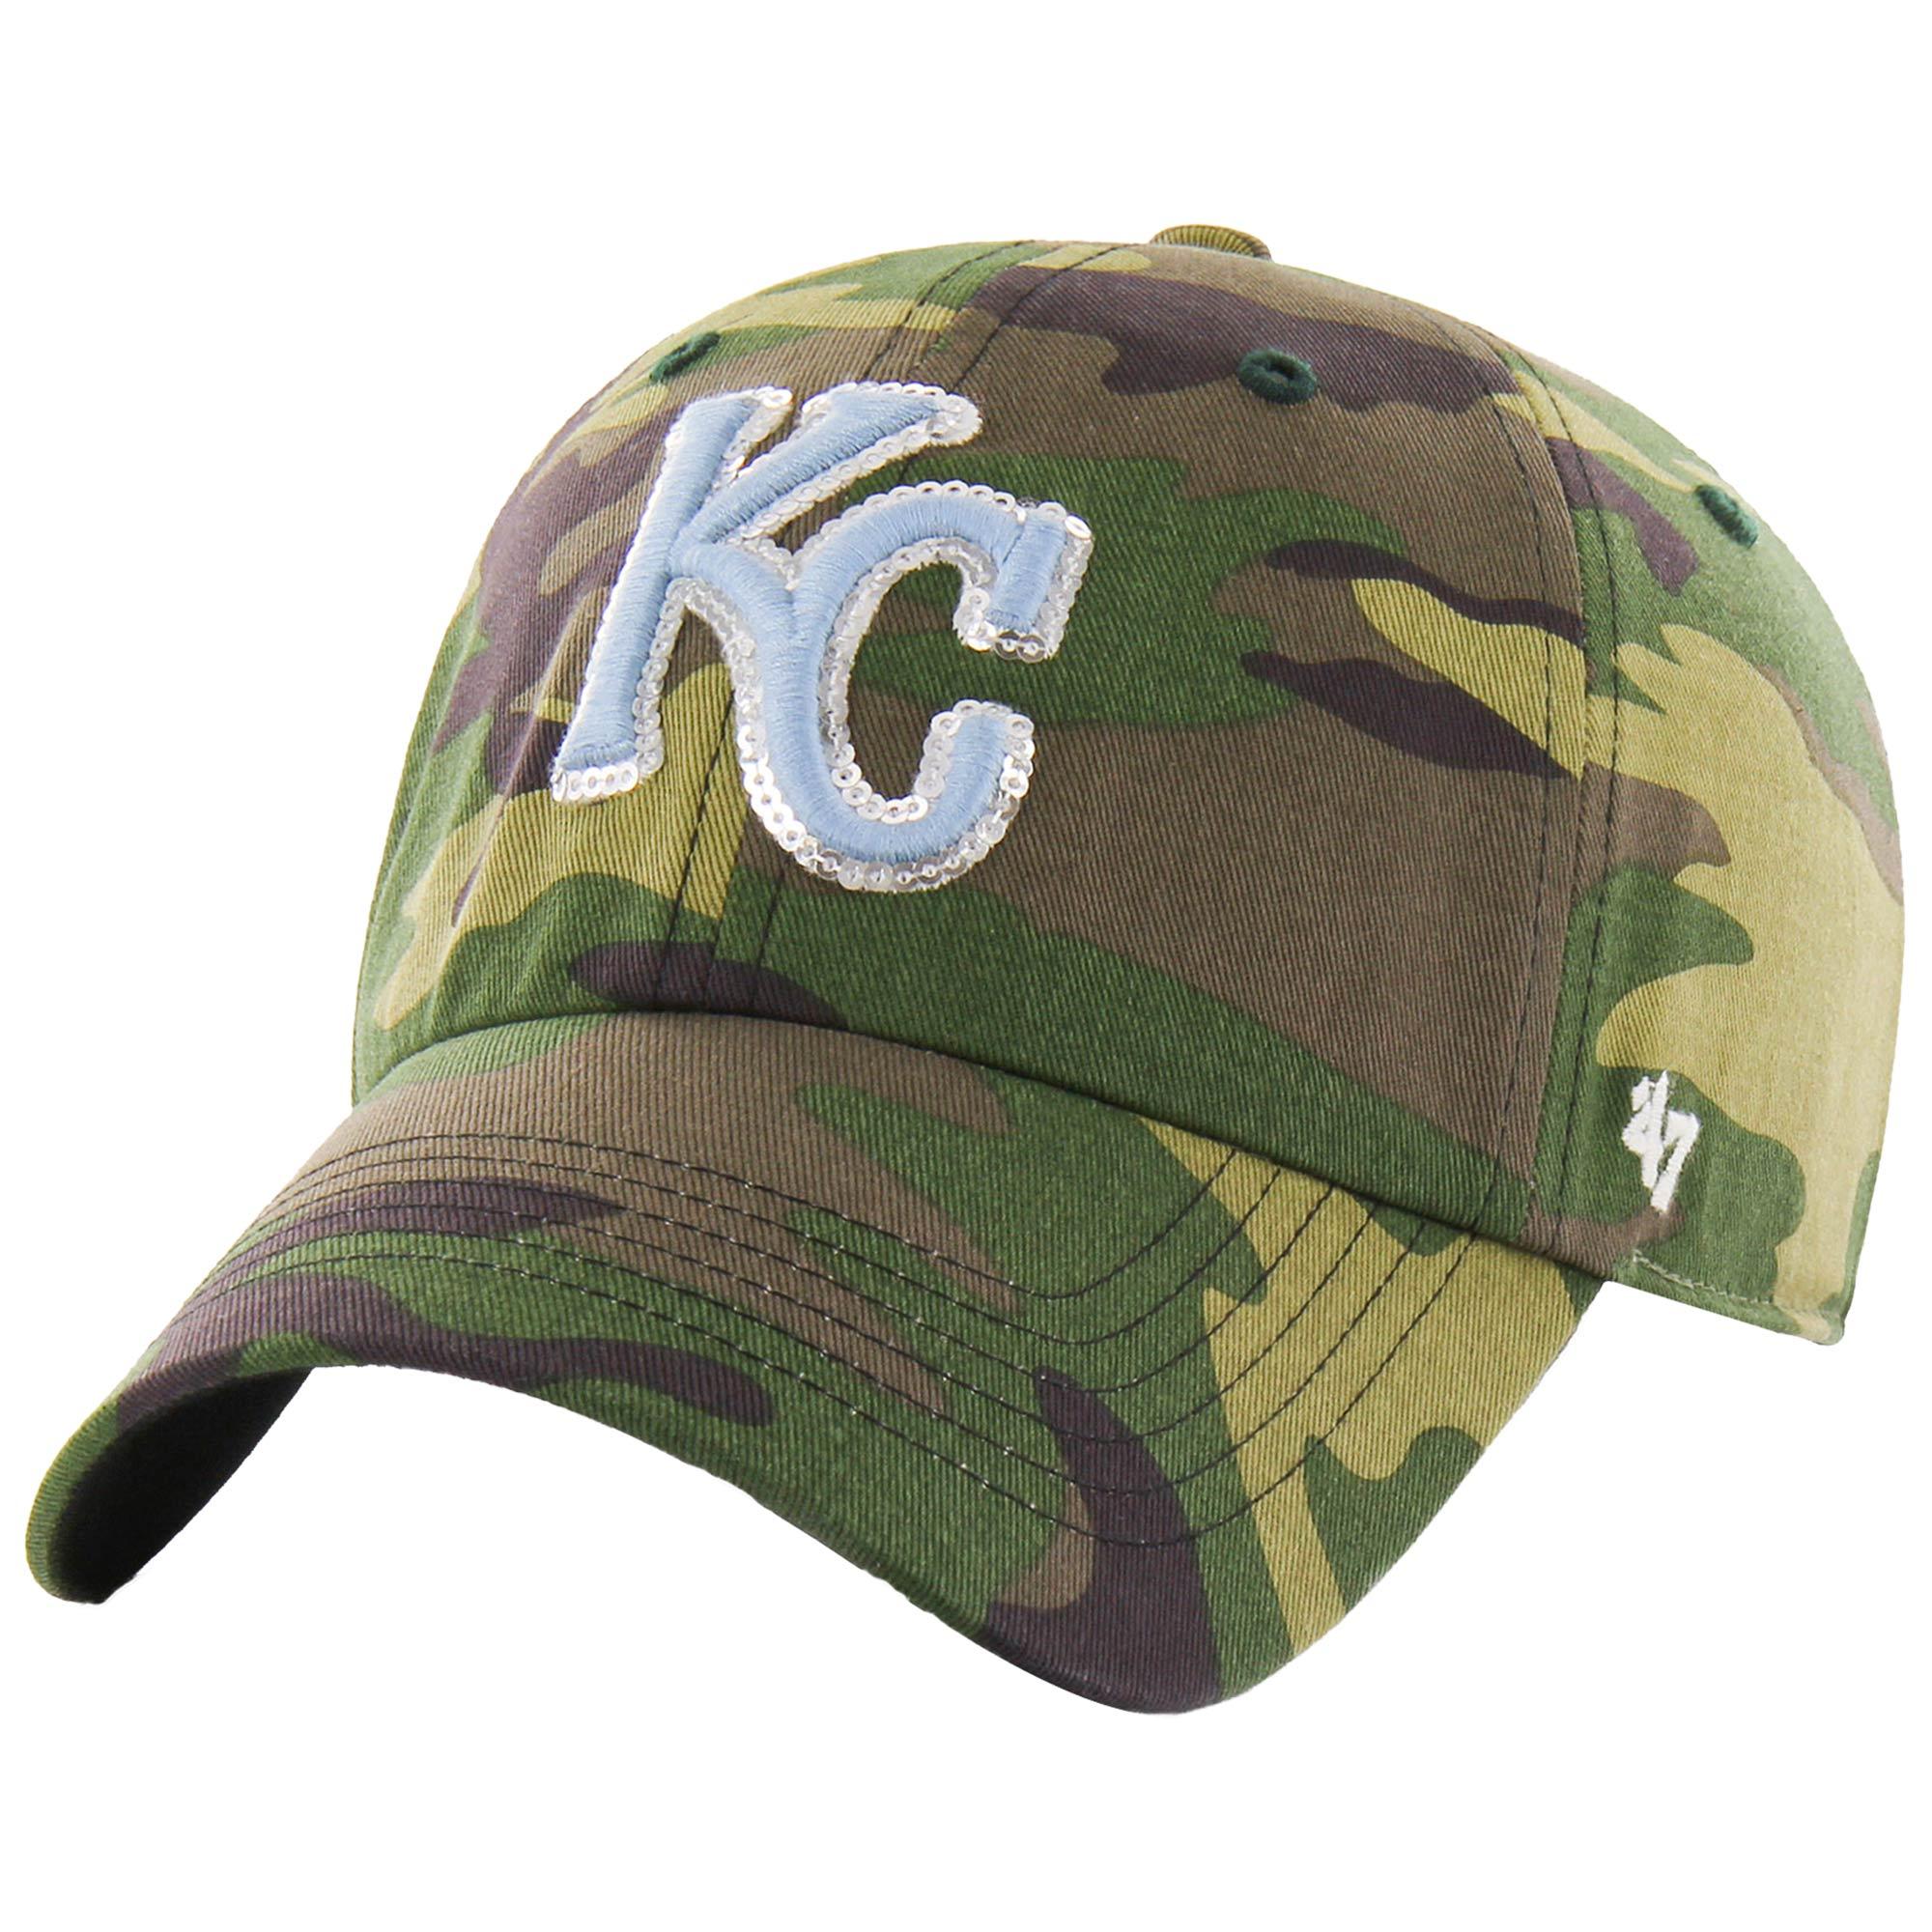 Kansas City Royals '47 Women's Rosita Clean Up Adjustable Hat - Camo - OSFA